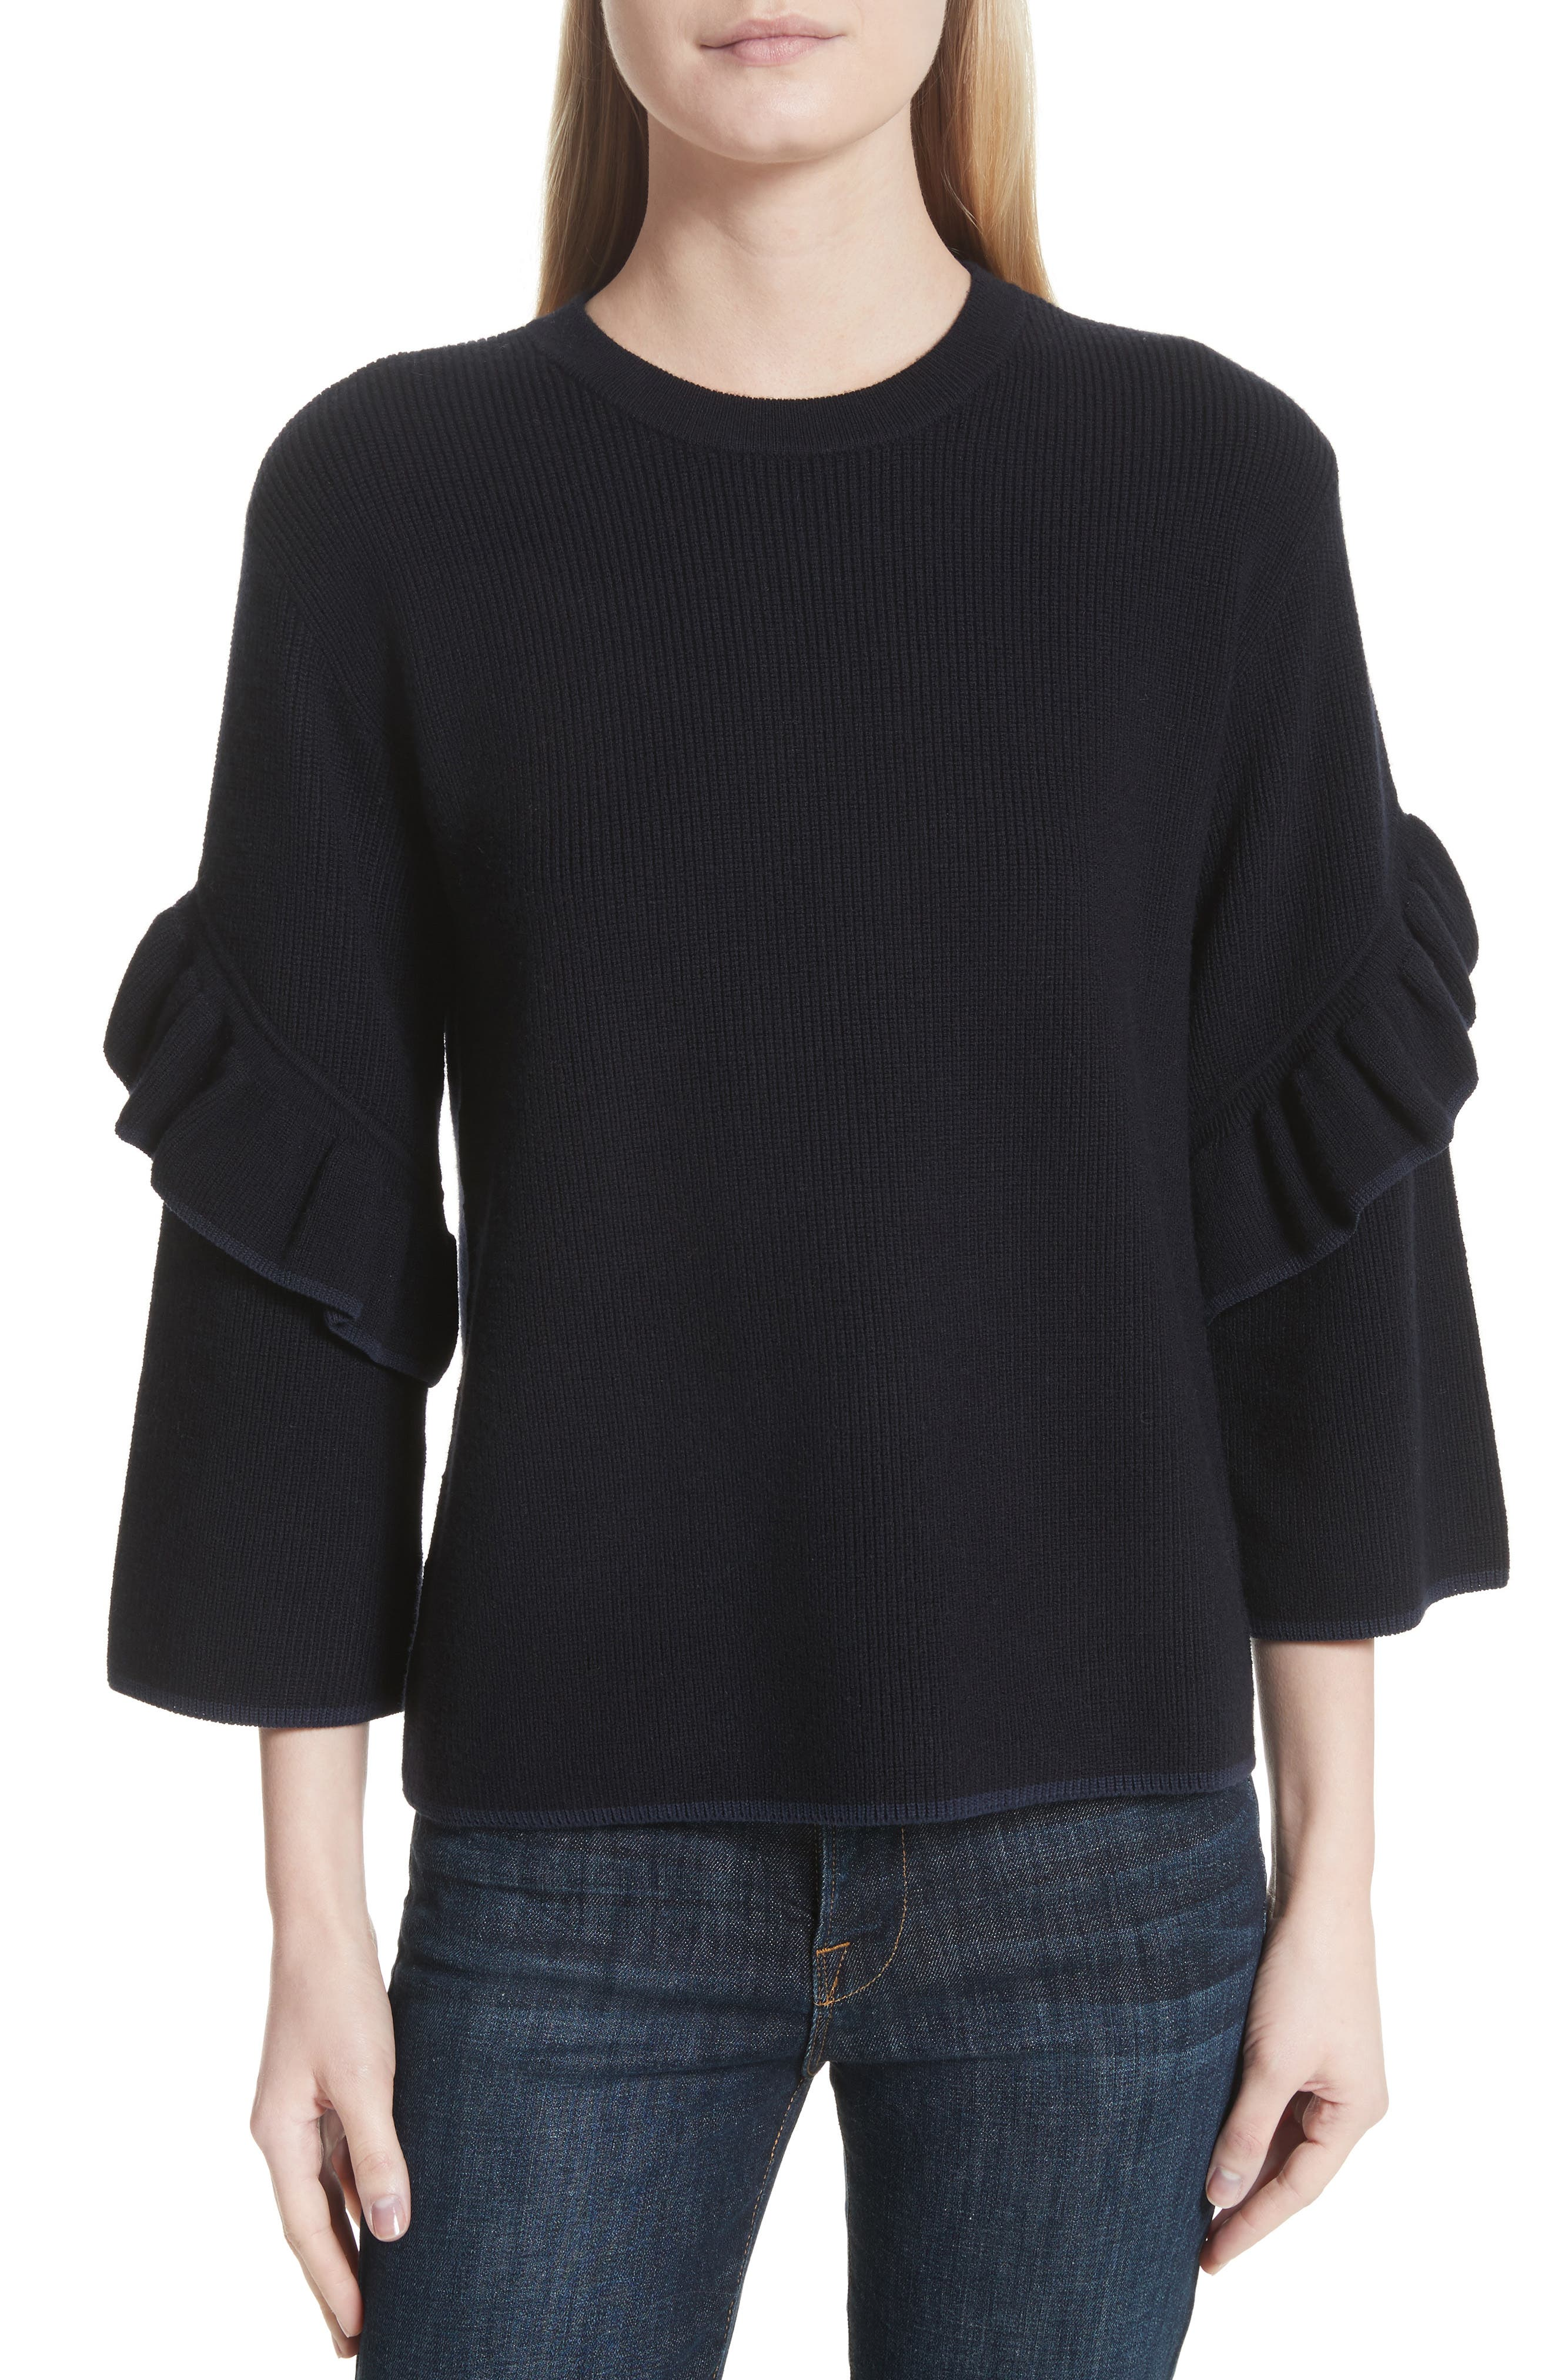 Tory Burch Ashley Ruffle Bell Sleeve Sweater